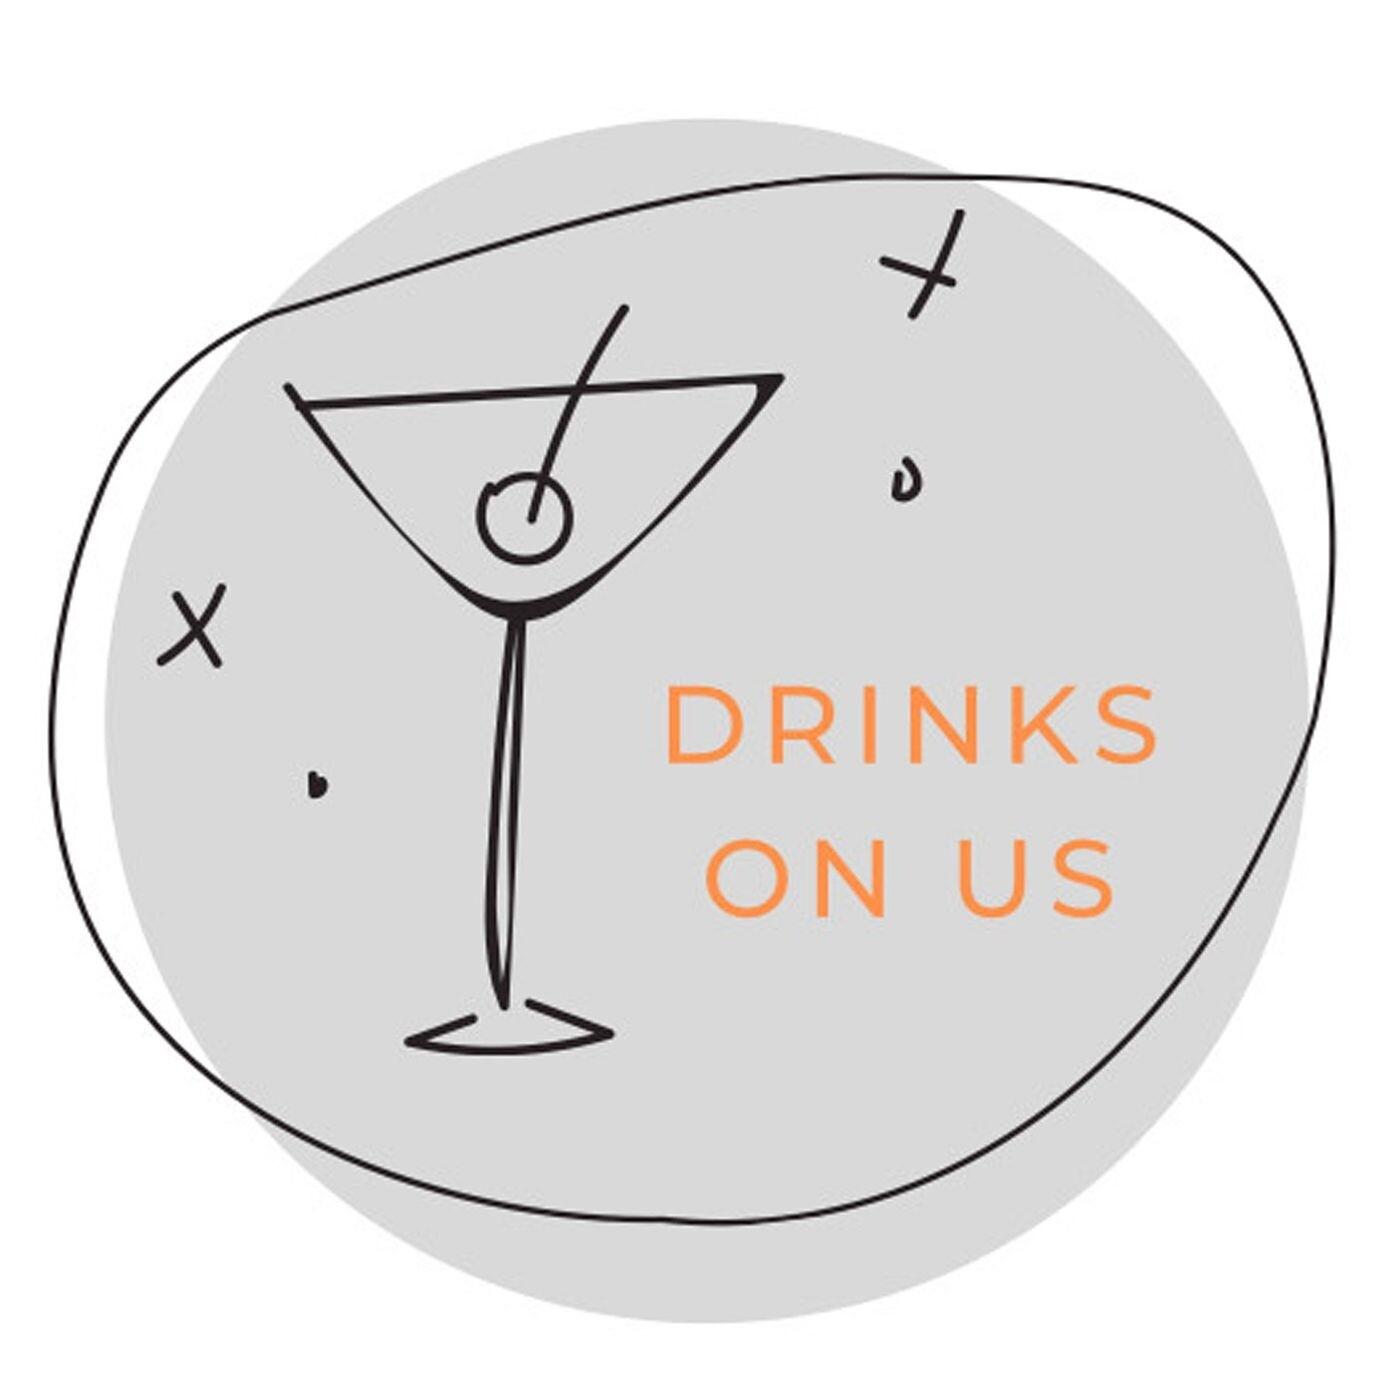 Drinks On Us - Sunday, October 18, 2020 - Tall Post Cider